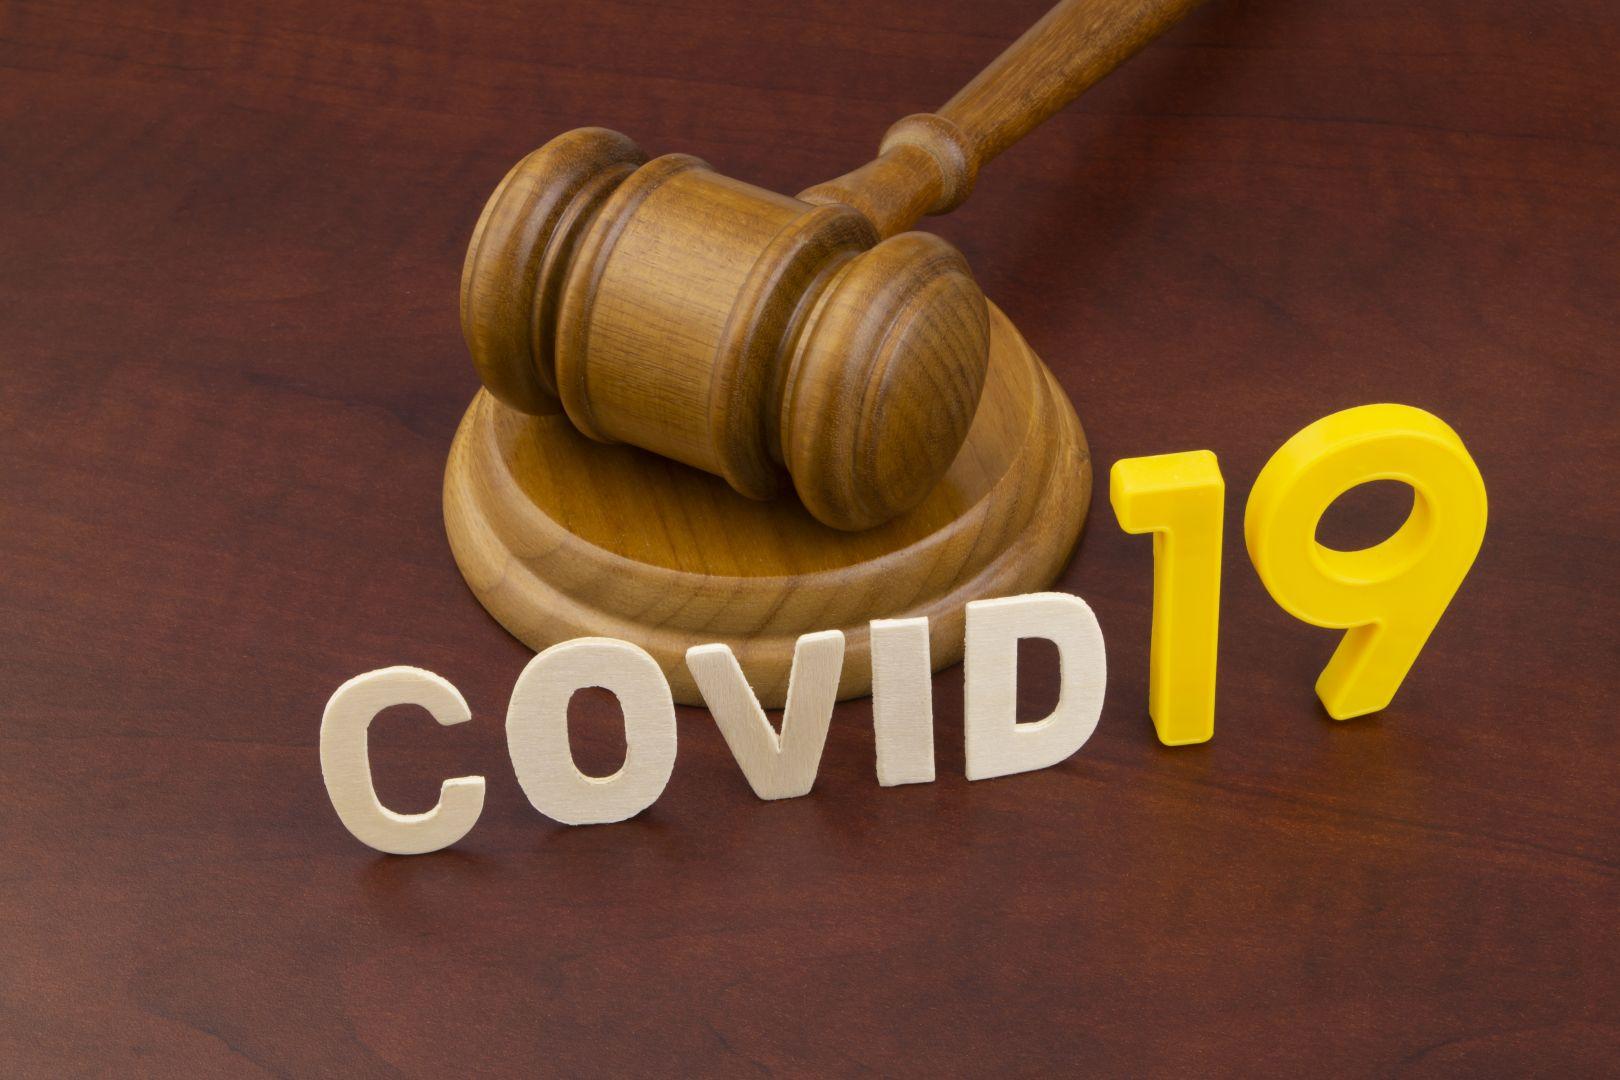 «COVID 19 : projet de loi d'urgence», Me Caroline Dubuis Talayrach, avocat